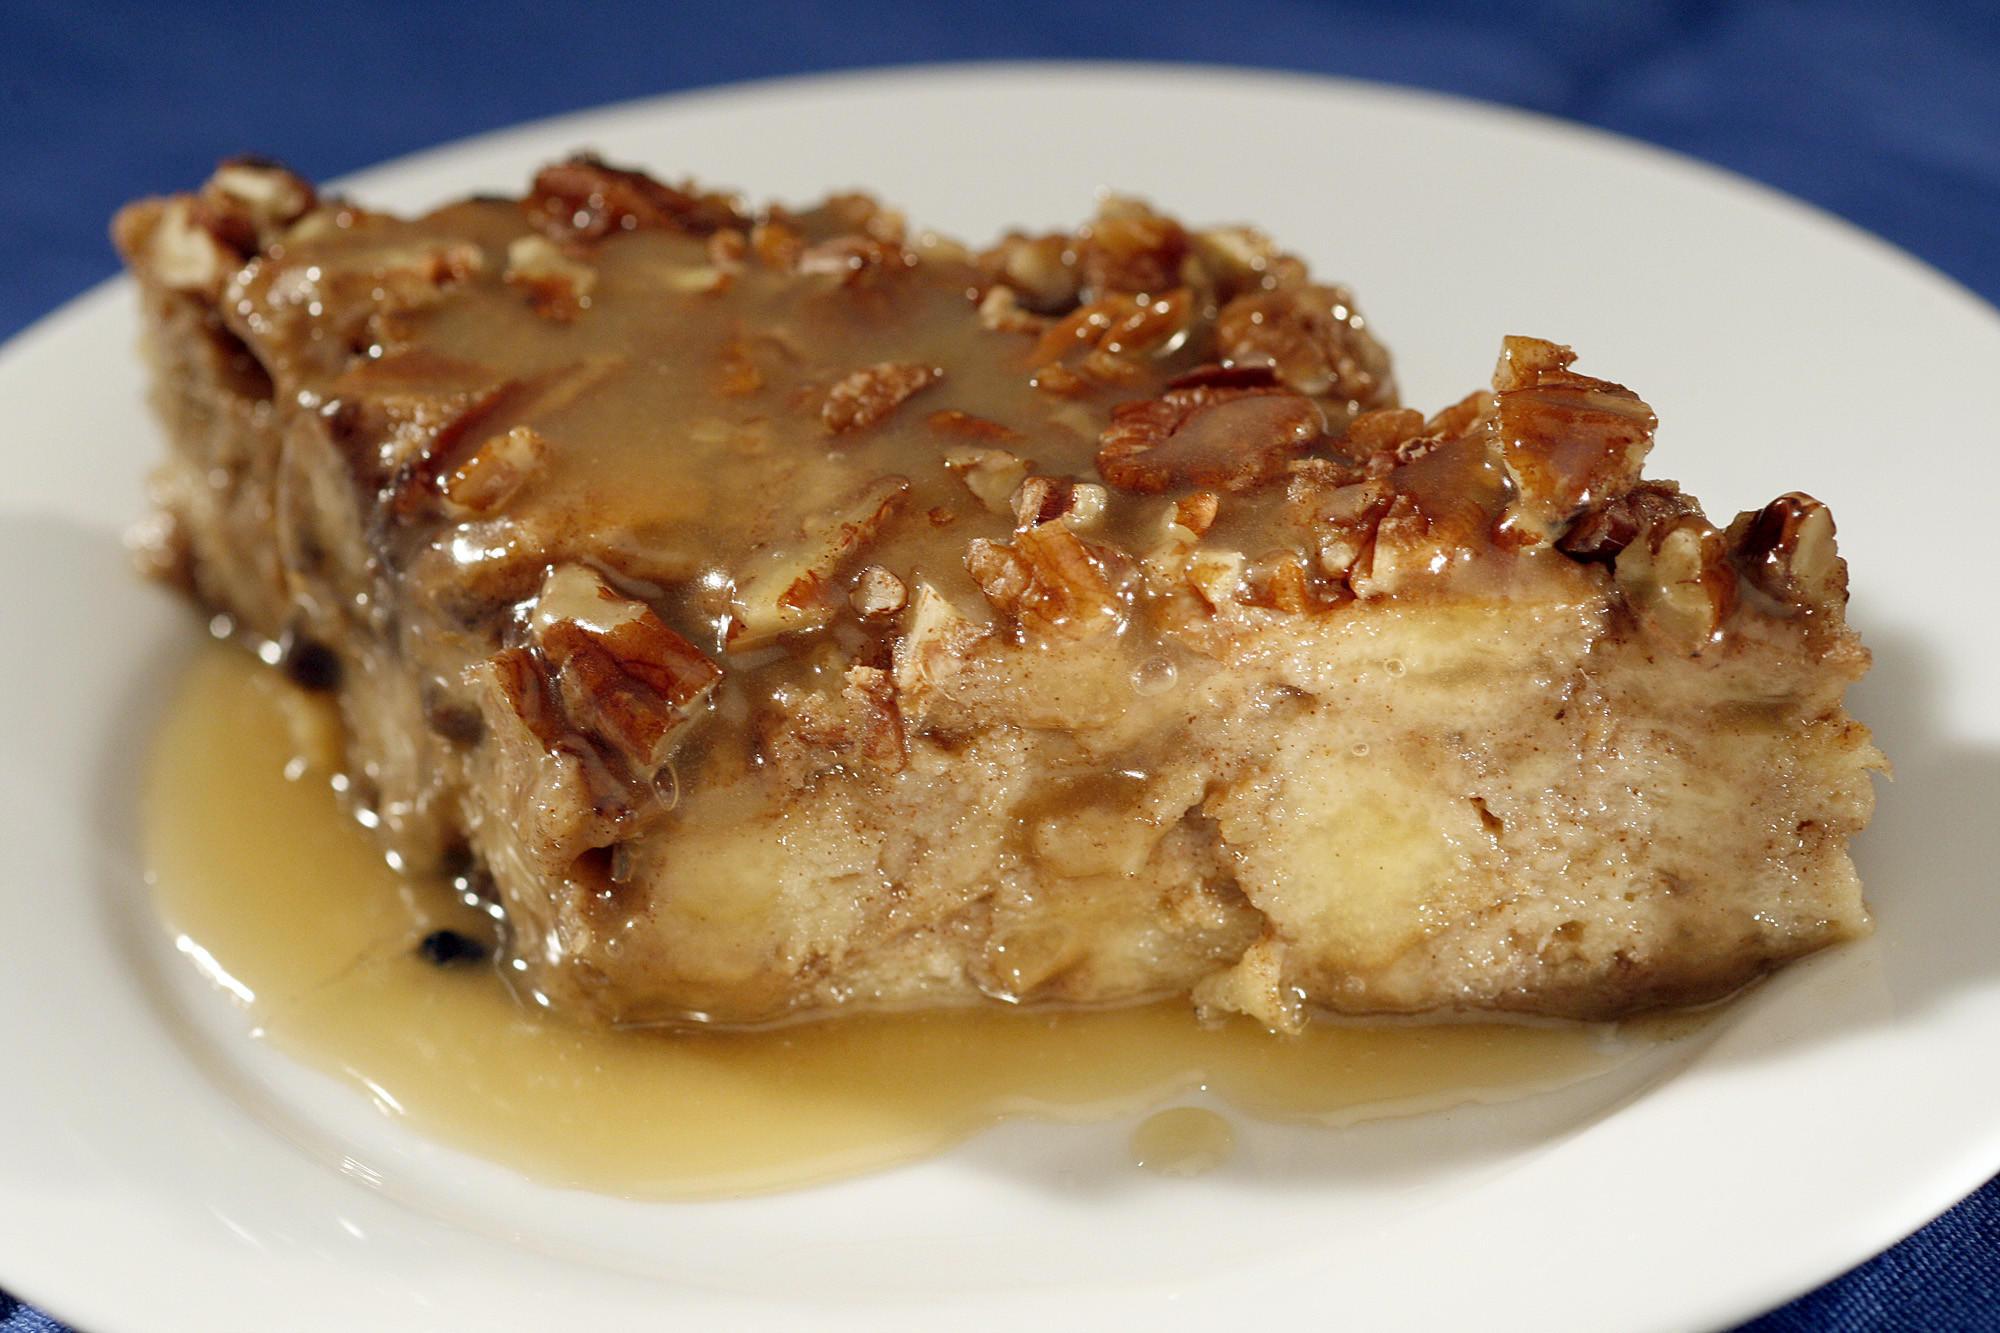 Sweet Potato Dessert Recipe  Recipe Zea s sweet potato bread pudding with rum sauce